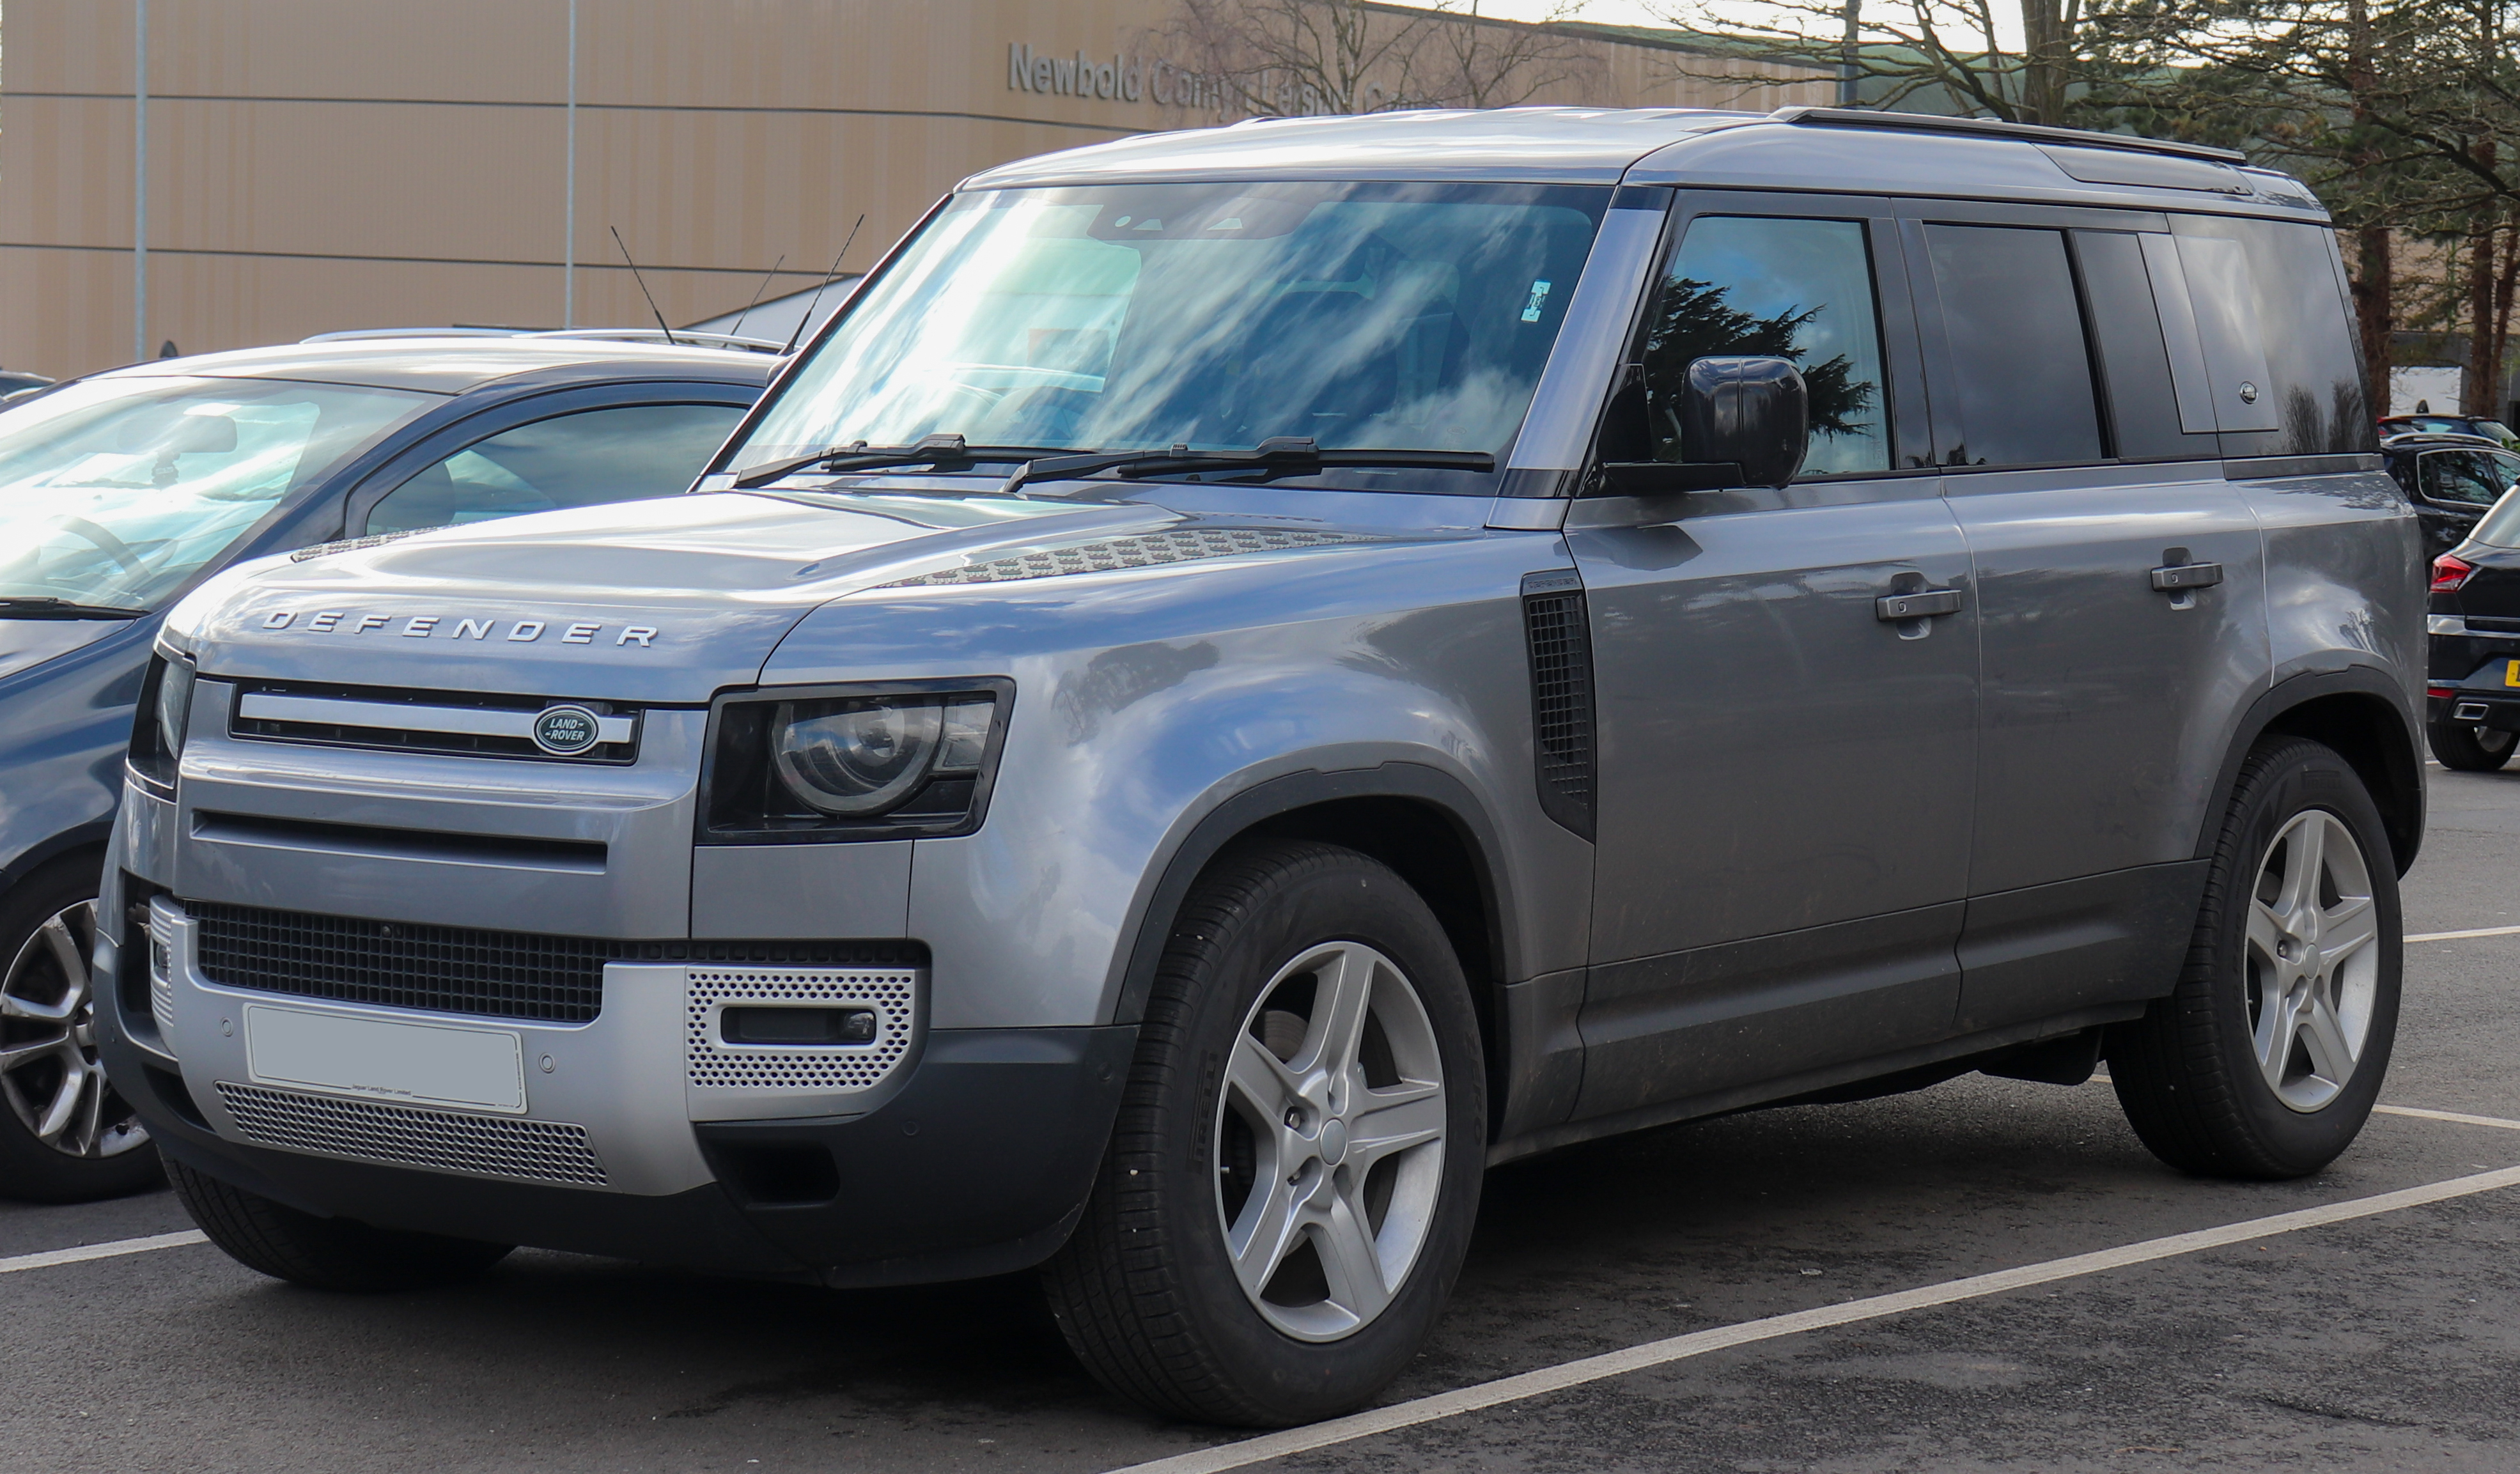 Land Rover Defender (L663) - Wikipedia